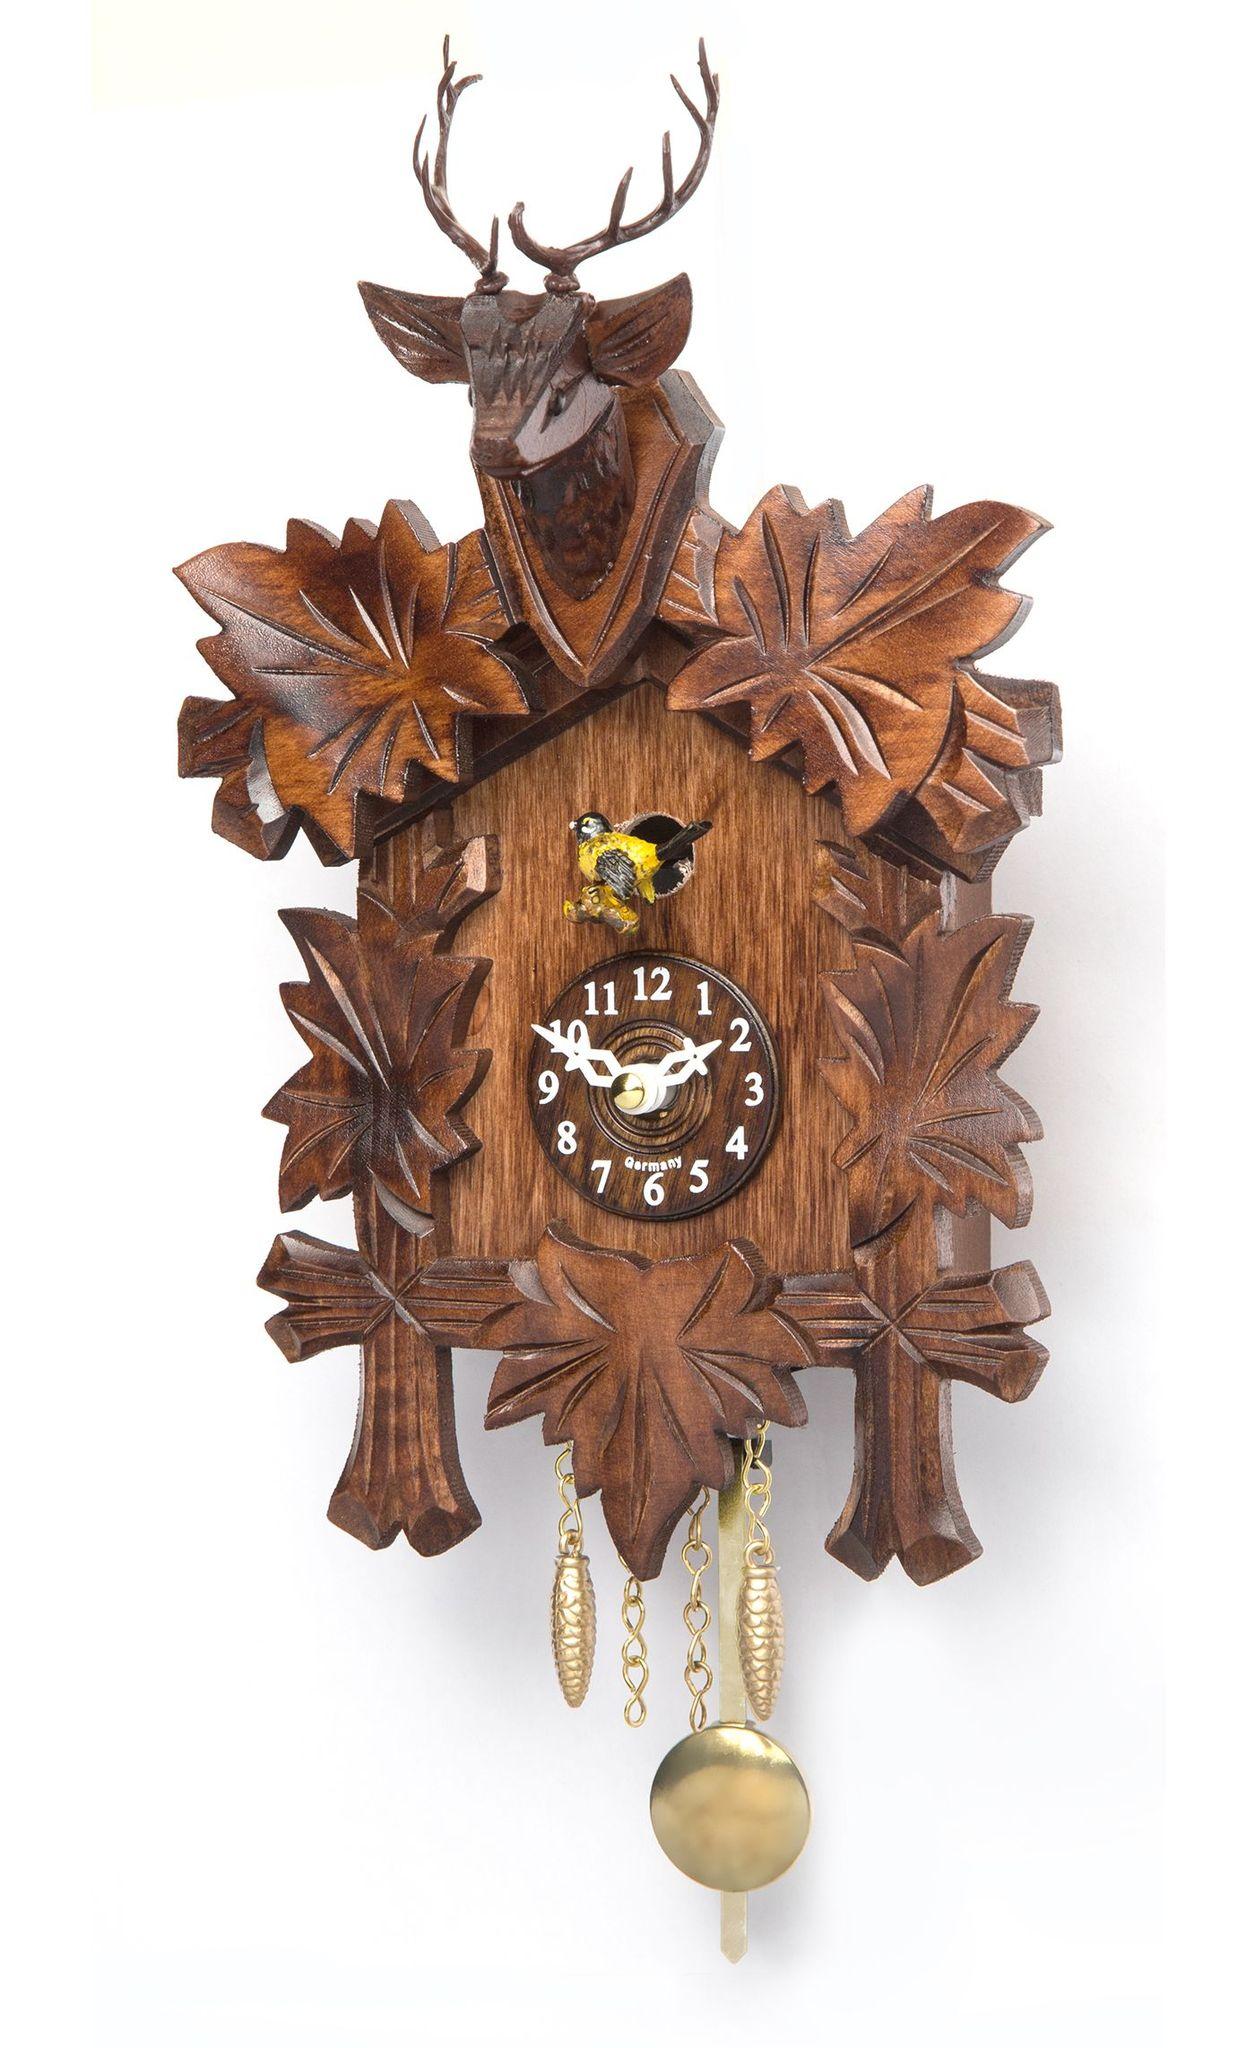 Часы настенные Часы настенные с кукушкой Tomas Stern 5023 chasy-nastennye-s-kukushkoy-tomas-stern-5023-germaniya.jpg